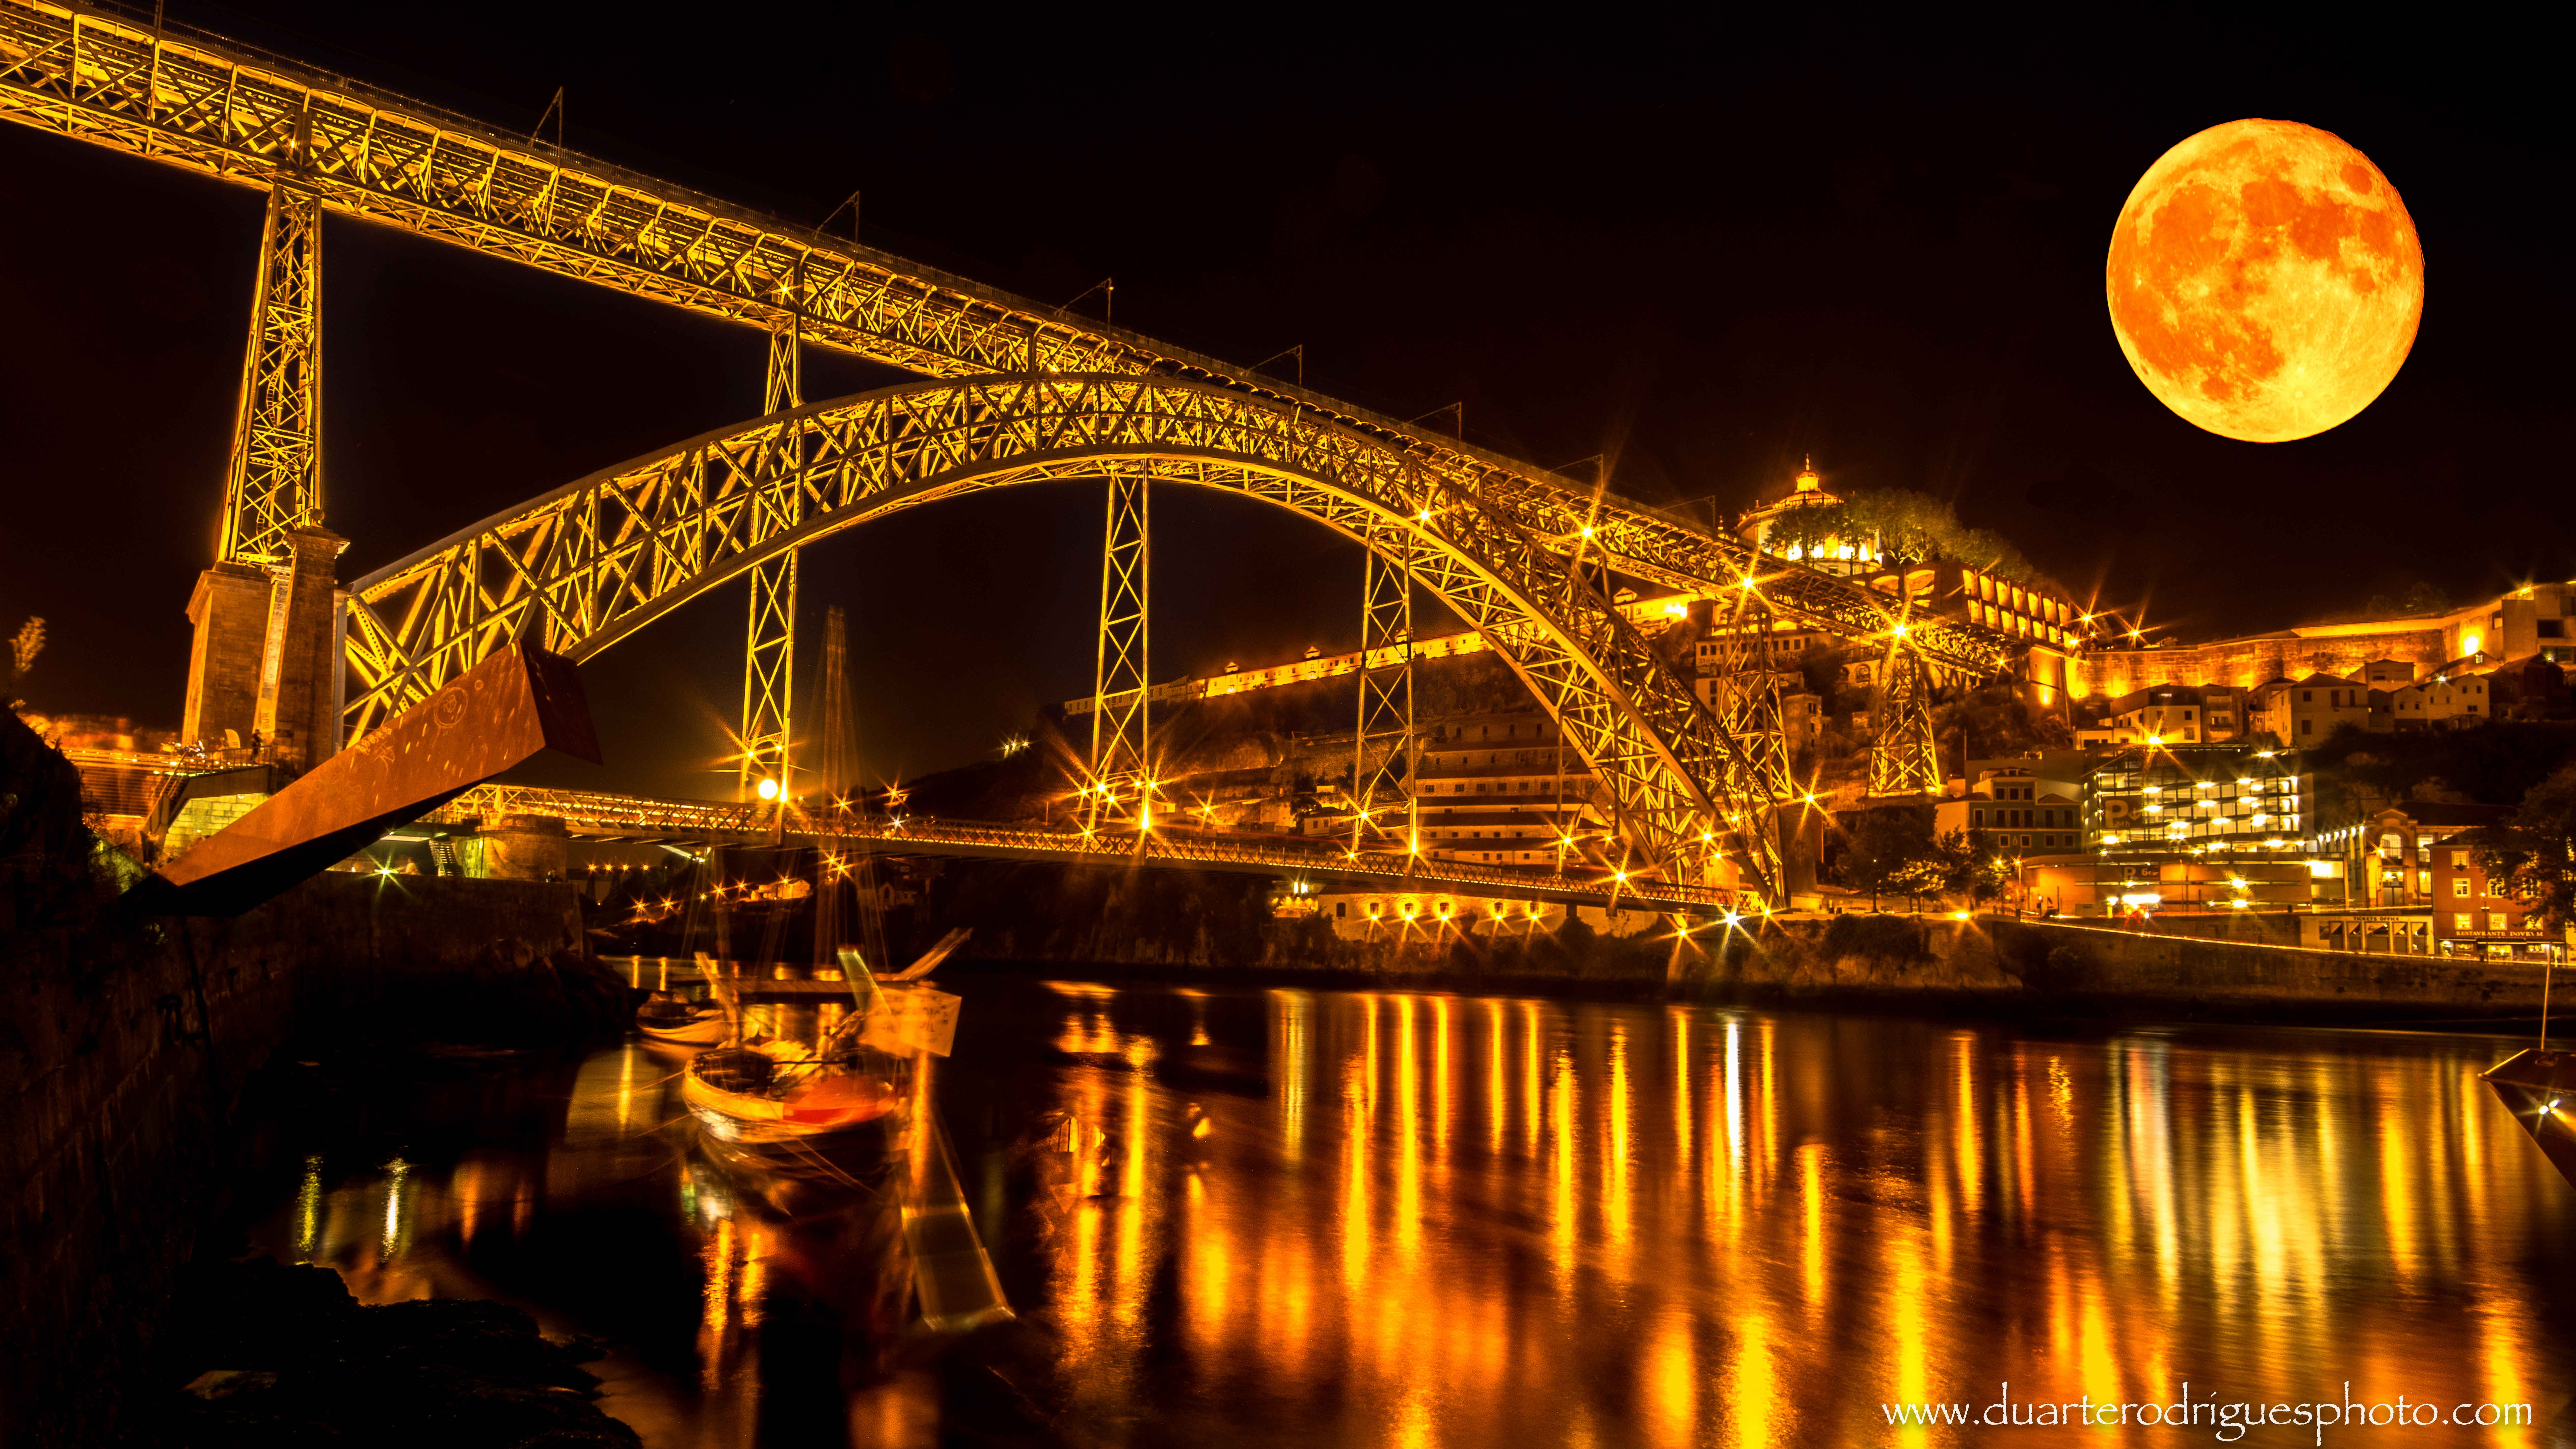 Ponte D. Luiz